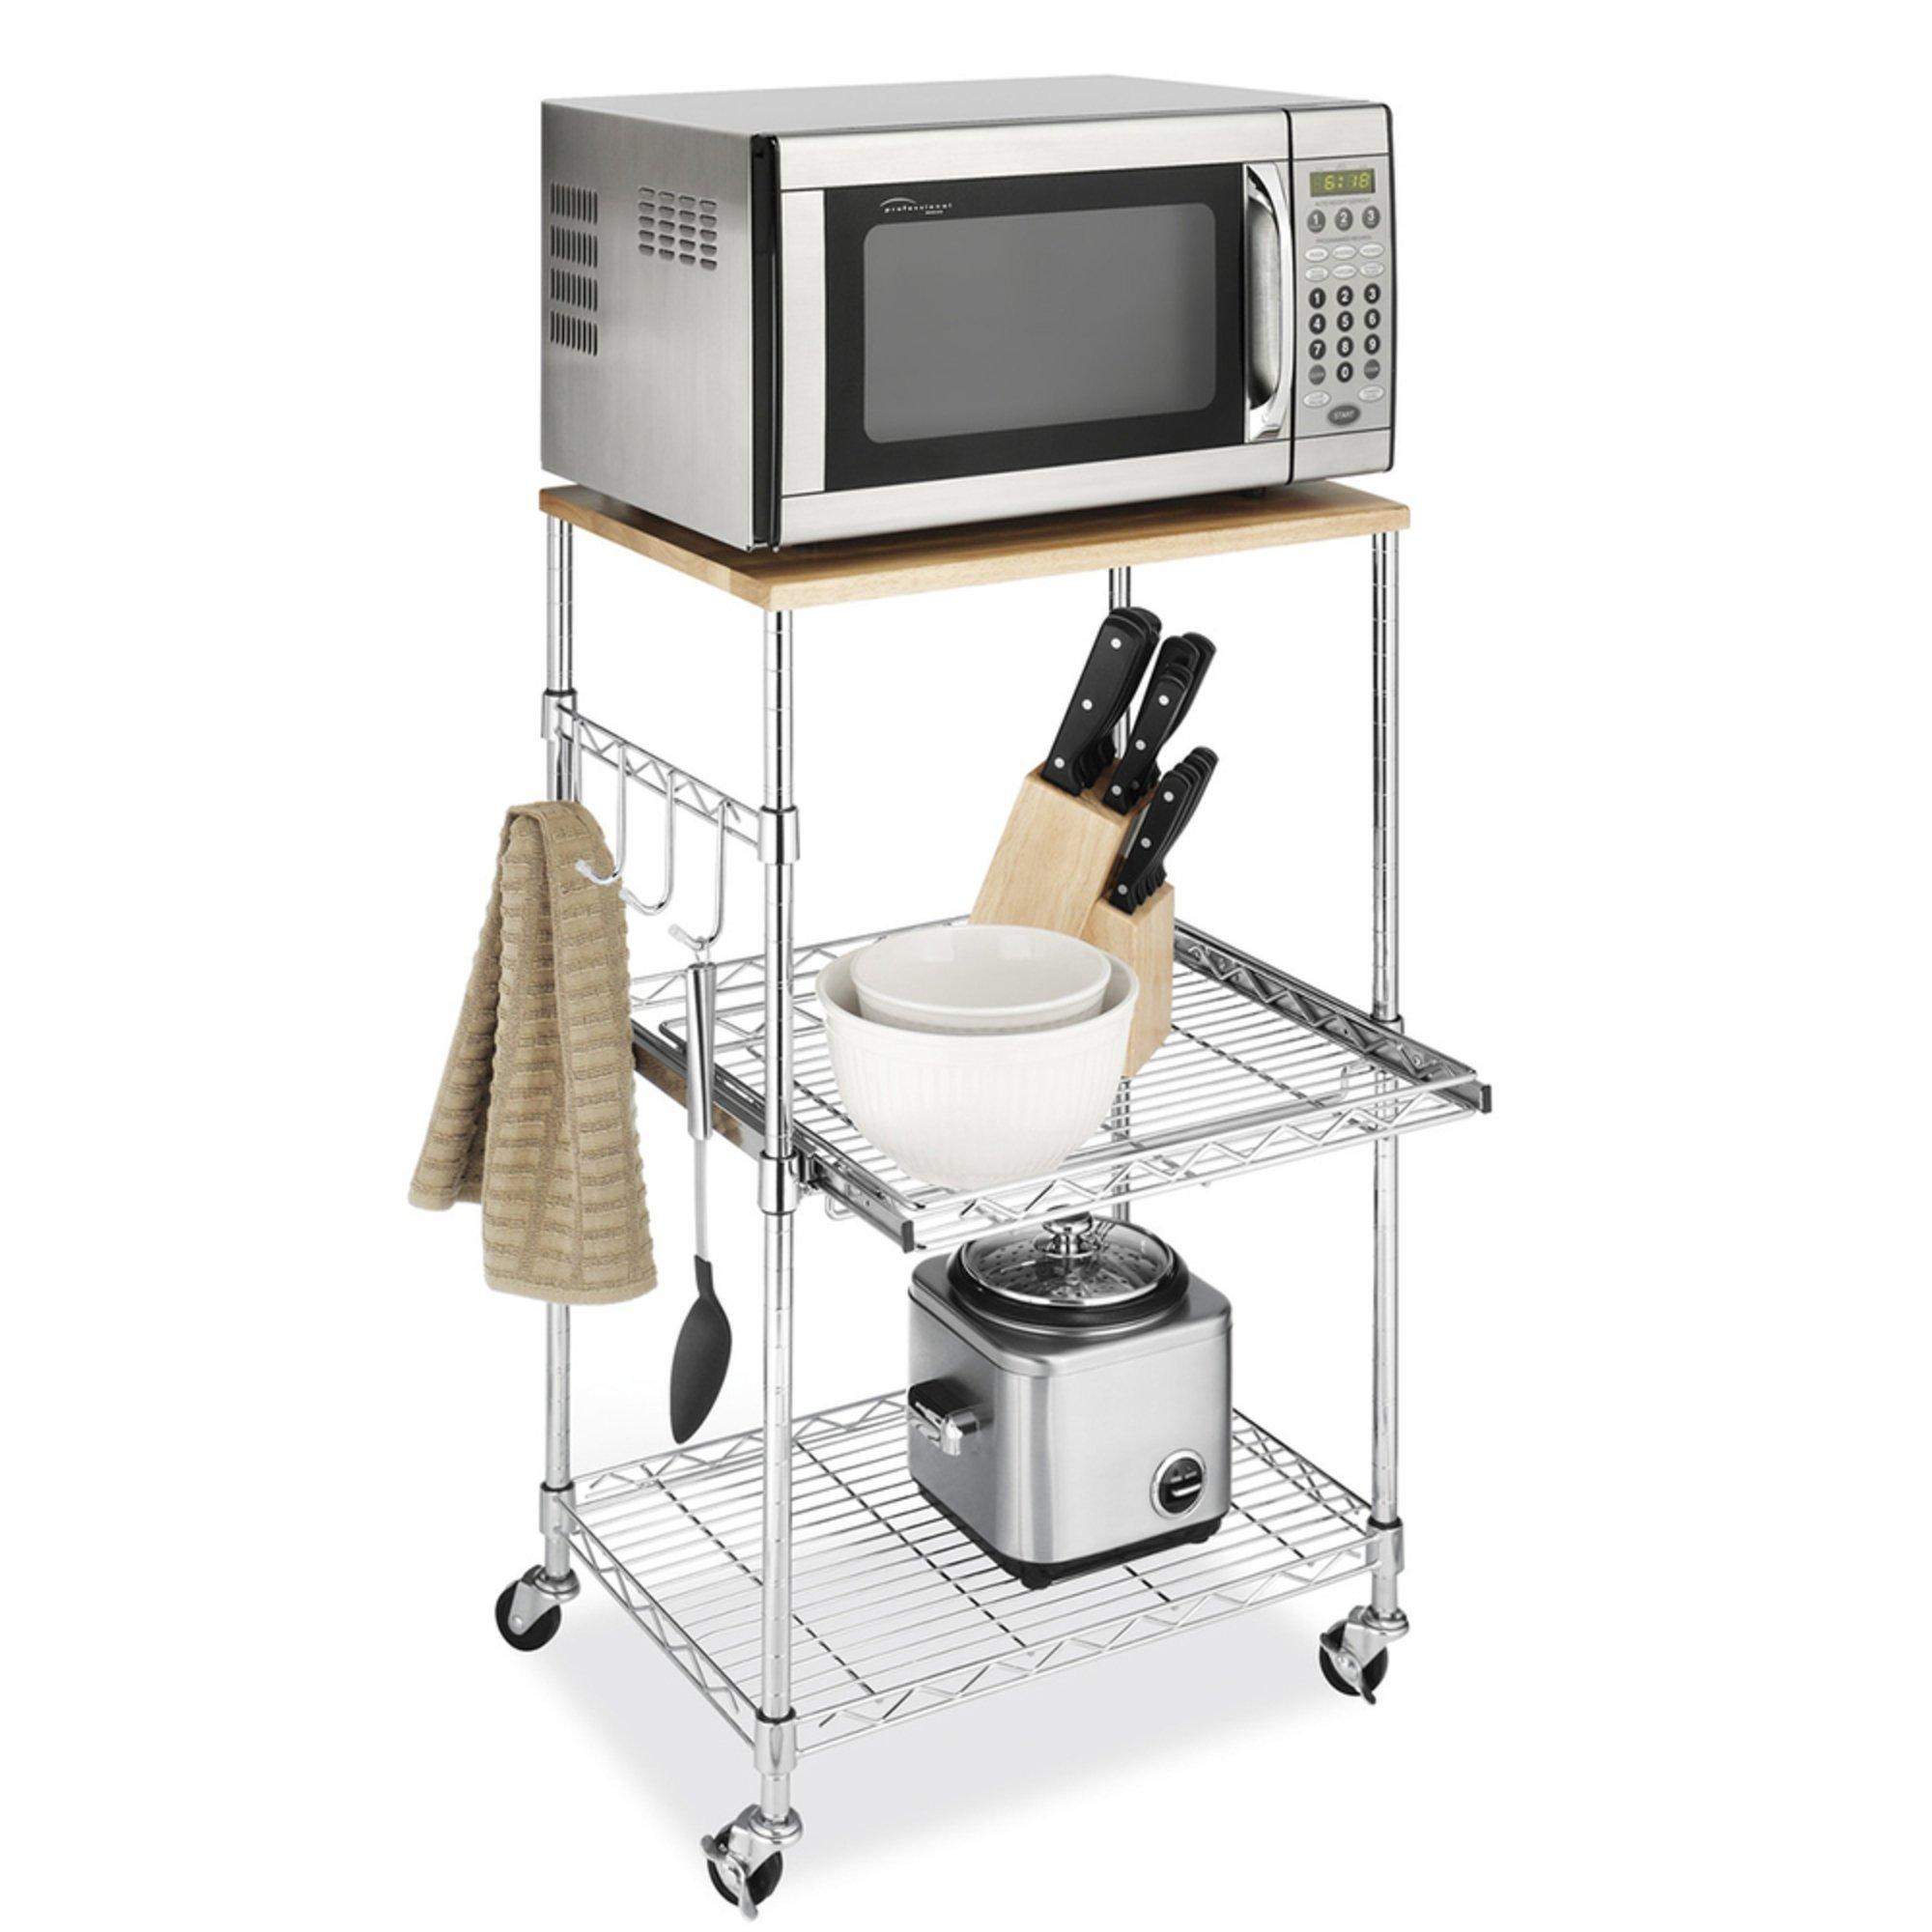 Countertop Microwave Stand : Whitmor Supreme Microwave Cart (6056-3536) Countertop Microwaves ...